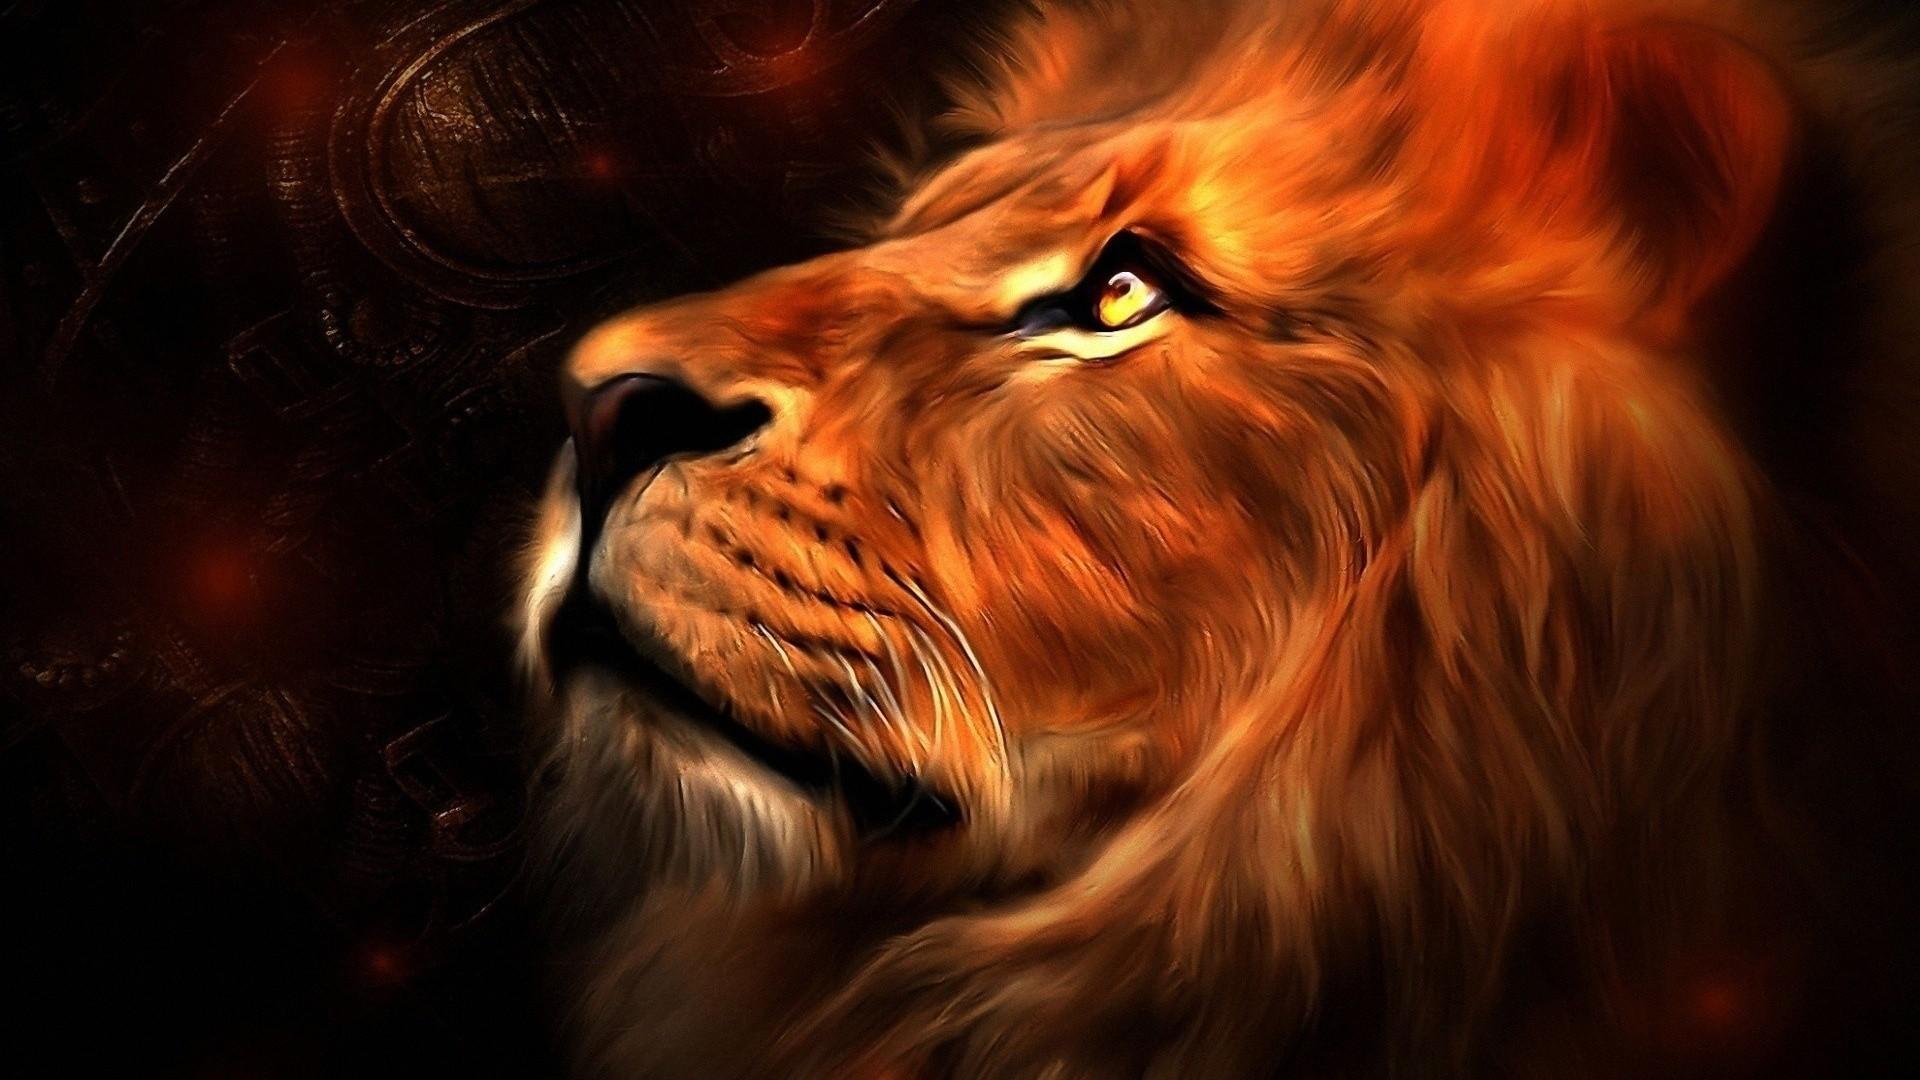 Colorful Lion Wallpaper 57 Images